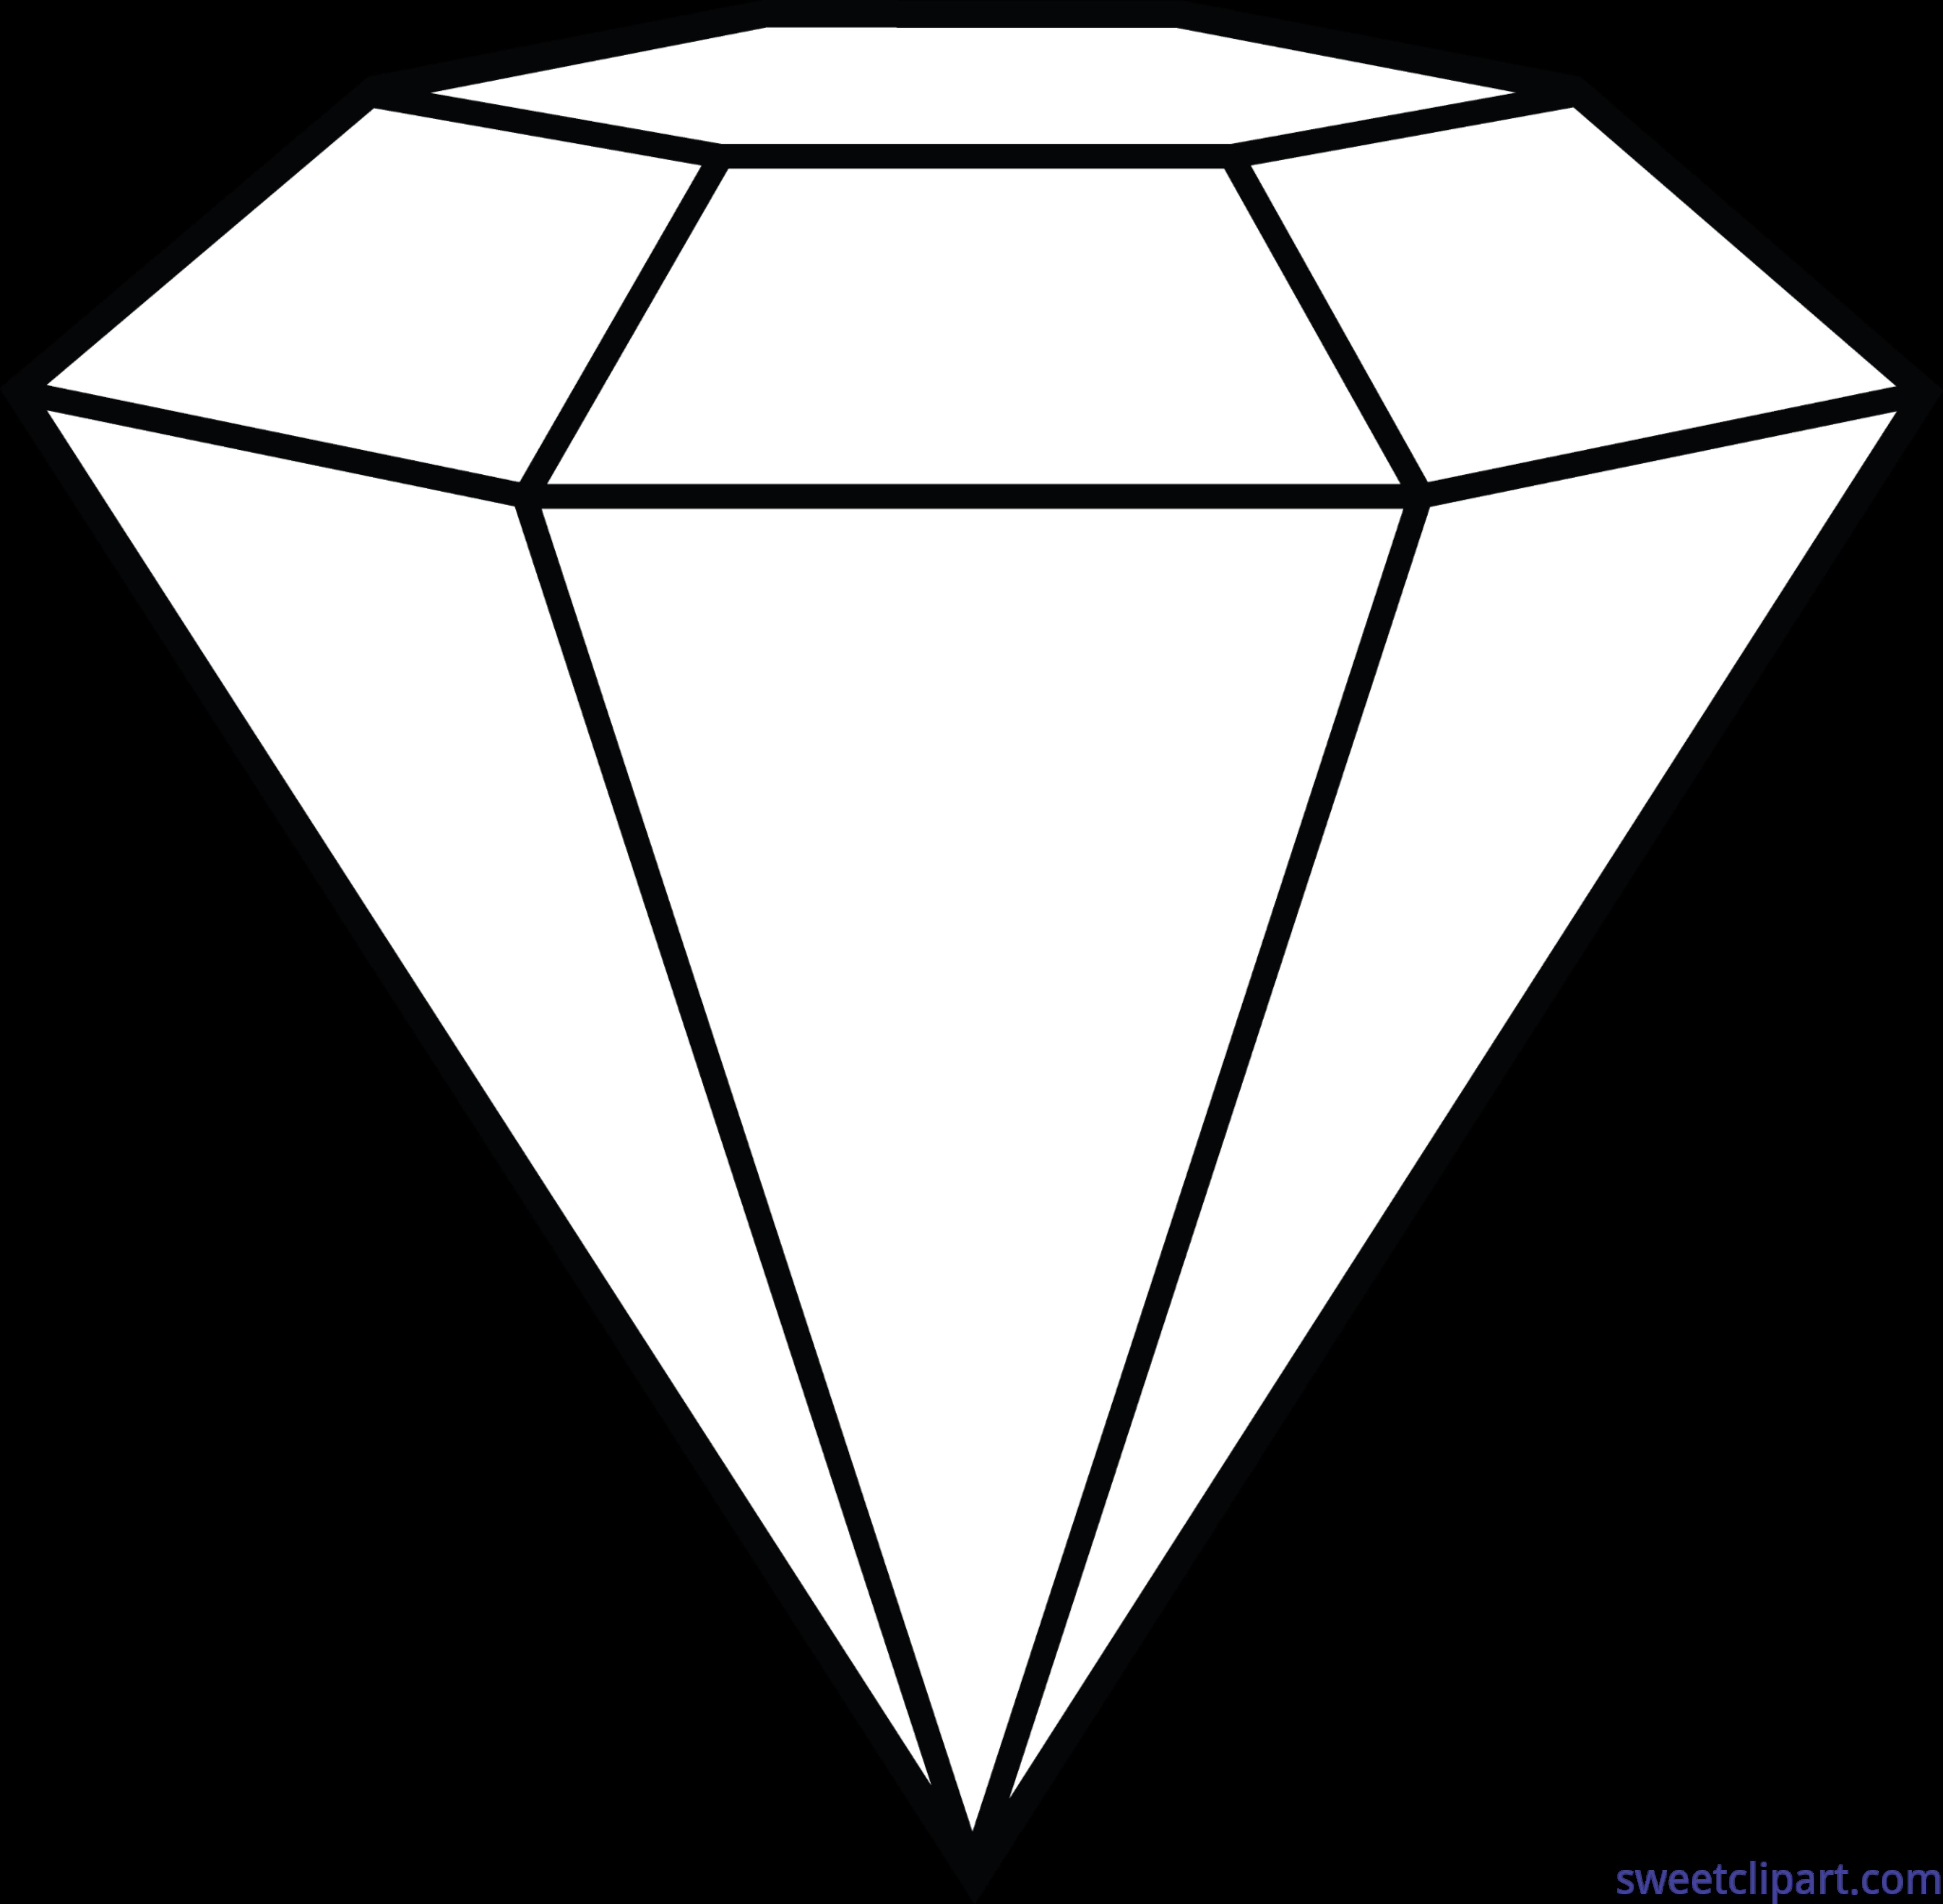 Diamond lineart clip art. Diamonds clipart triangle